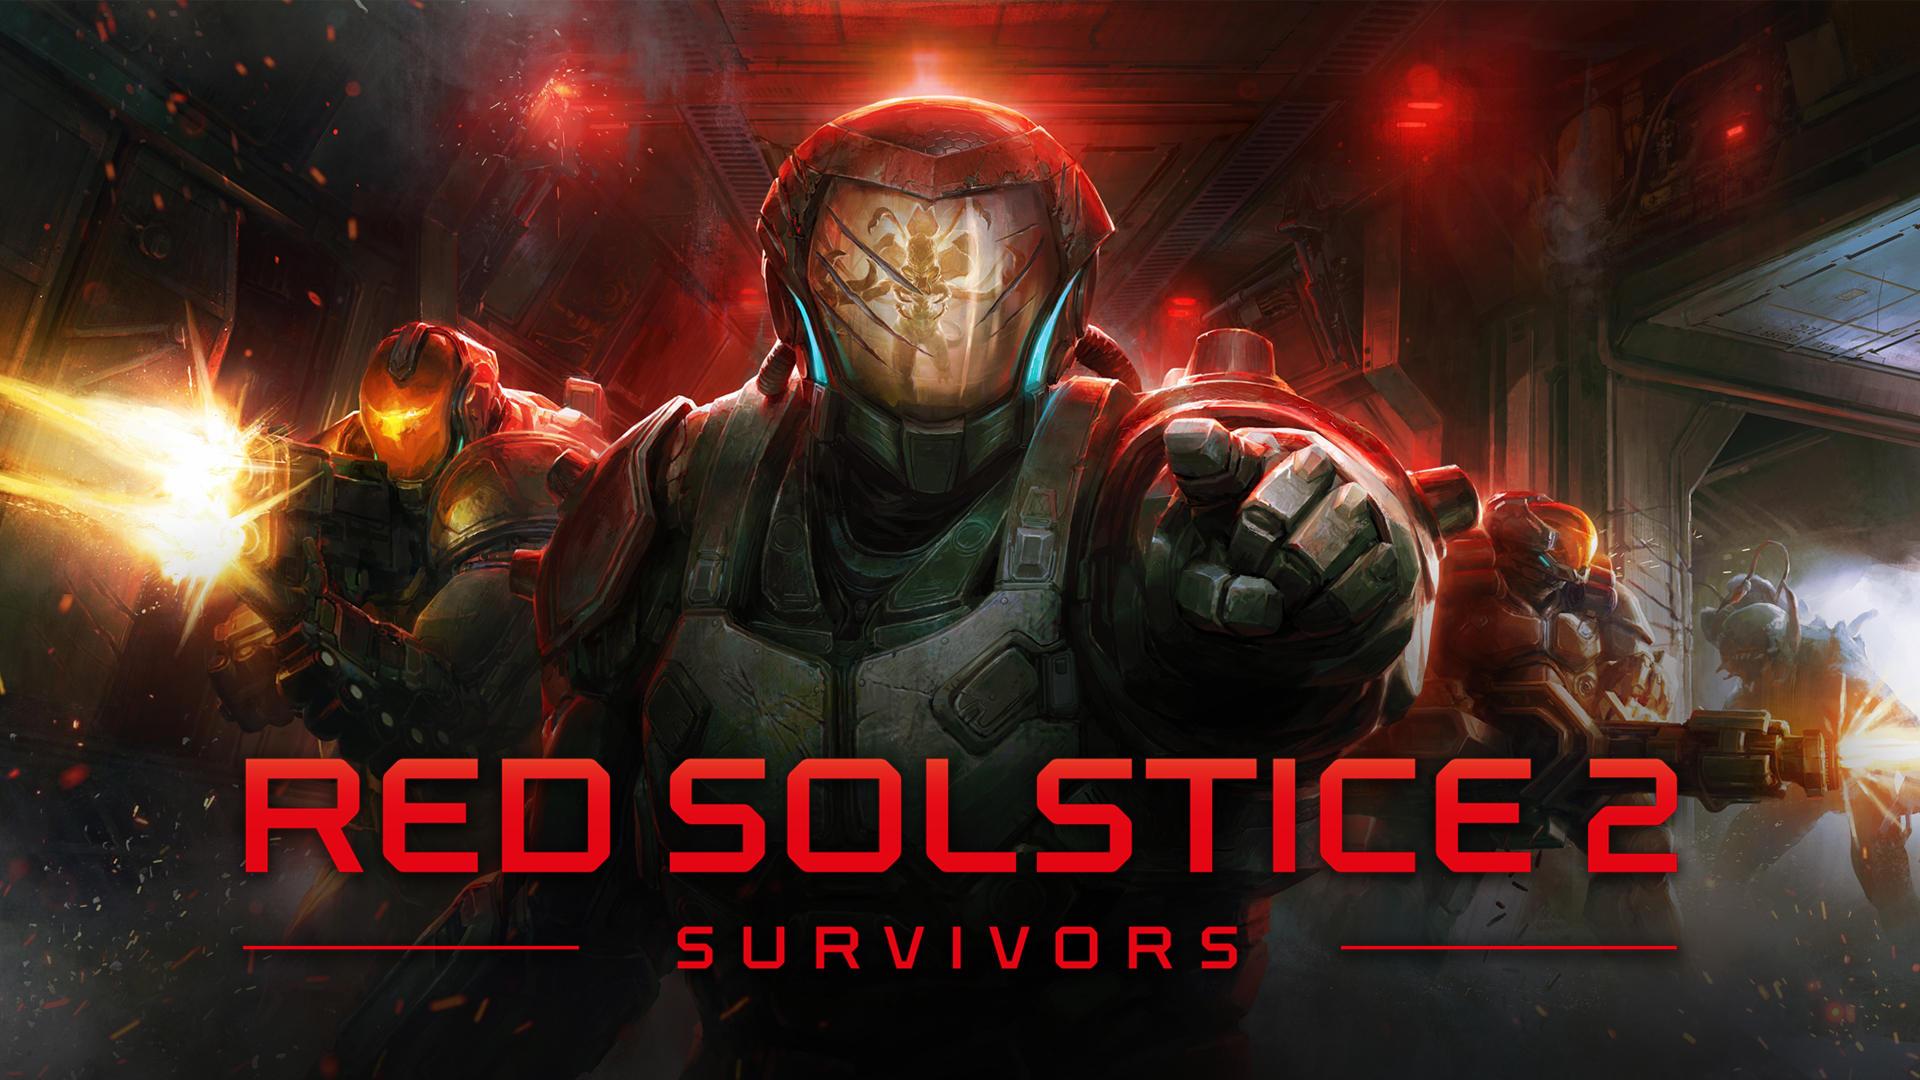 Red Solstice 2: Survivors logo and artwork